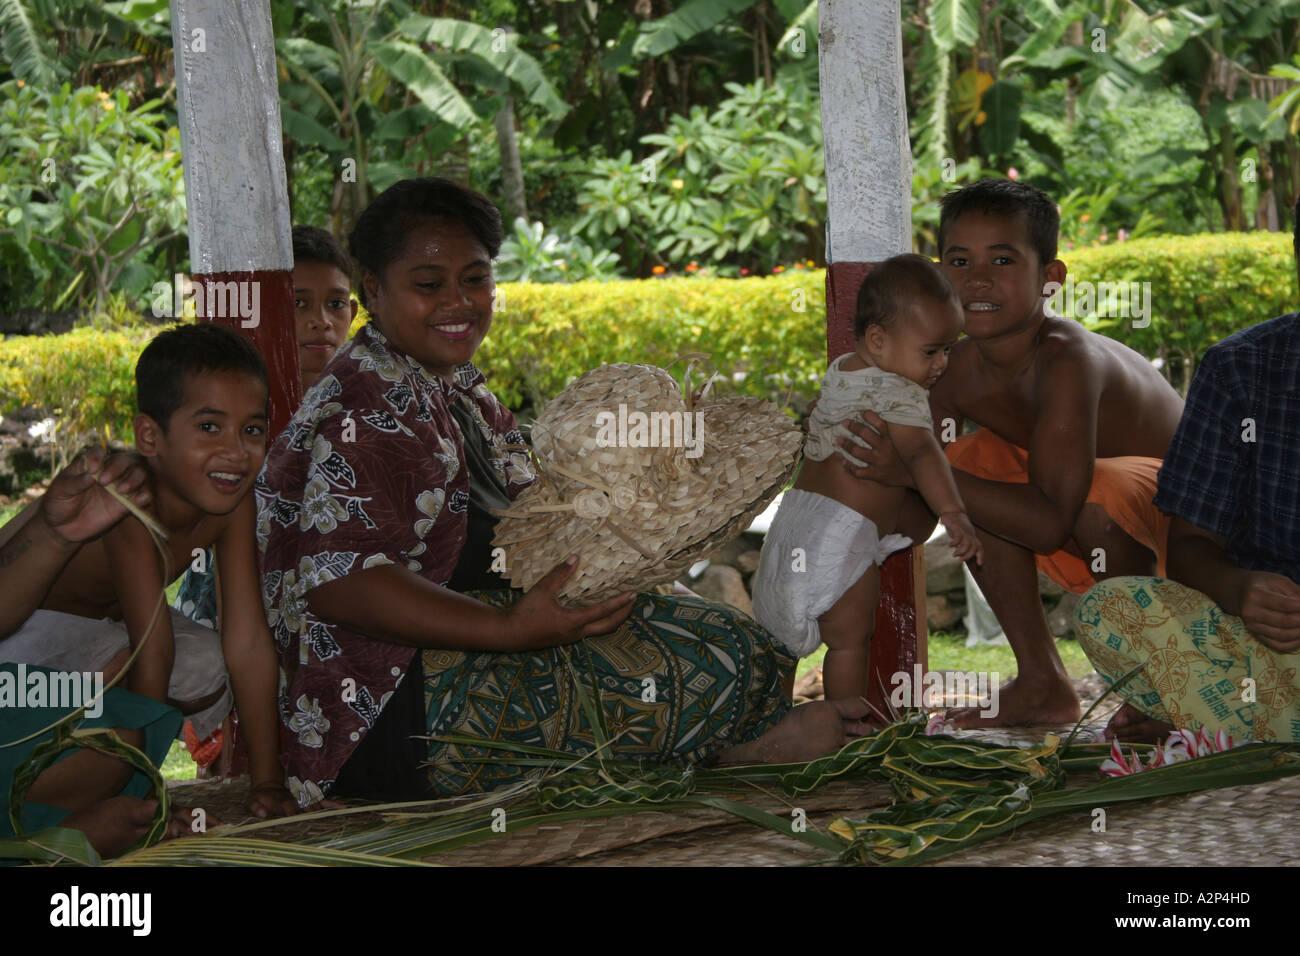 Samoan Family Stock Photos & Samoan Family Stock Images - Alamy